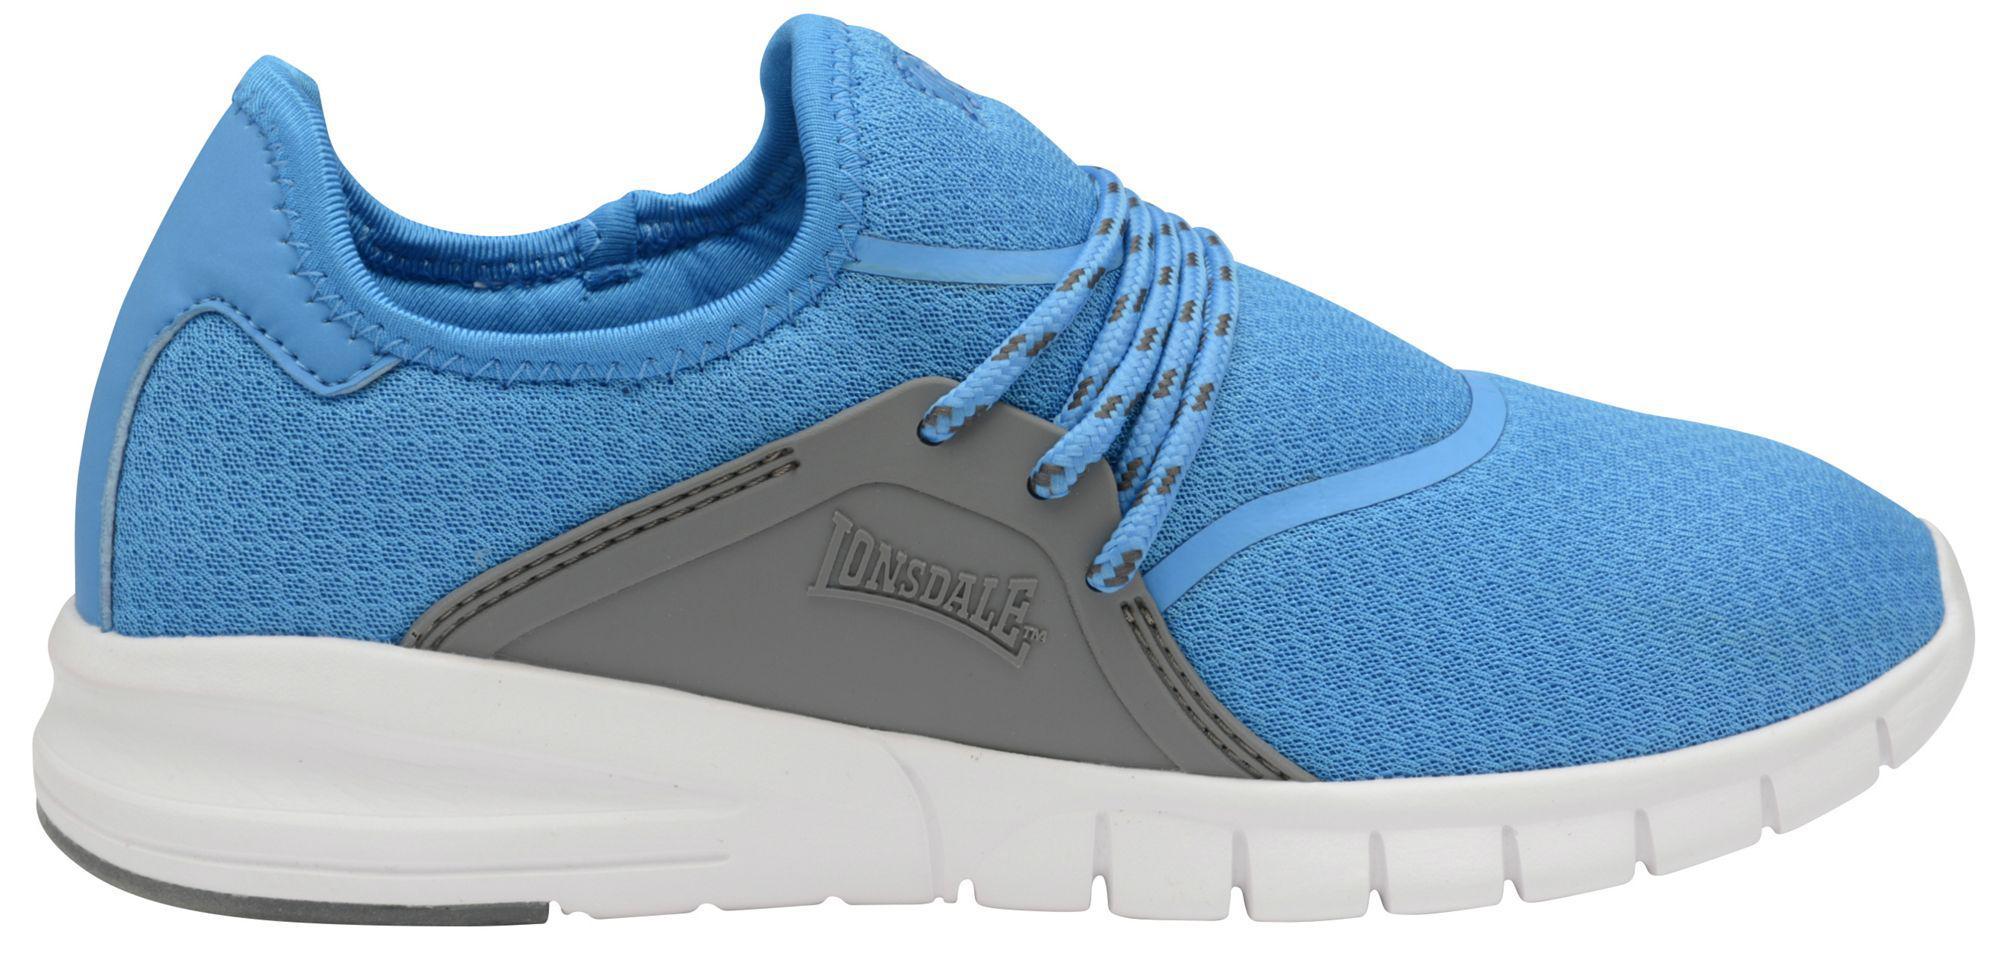 Process blue grey 'Sirius' ladies trainers free shipping ebay outlet shopping online qOKzMkYM